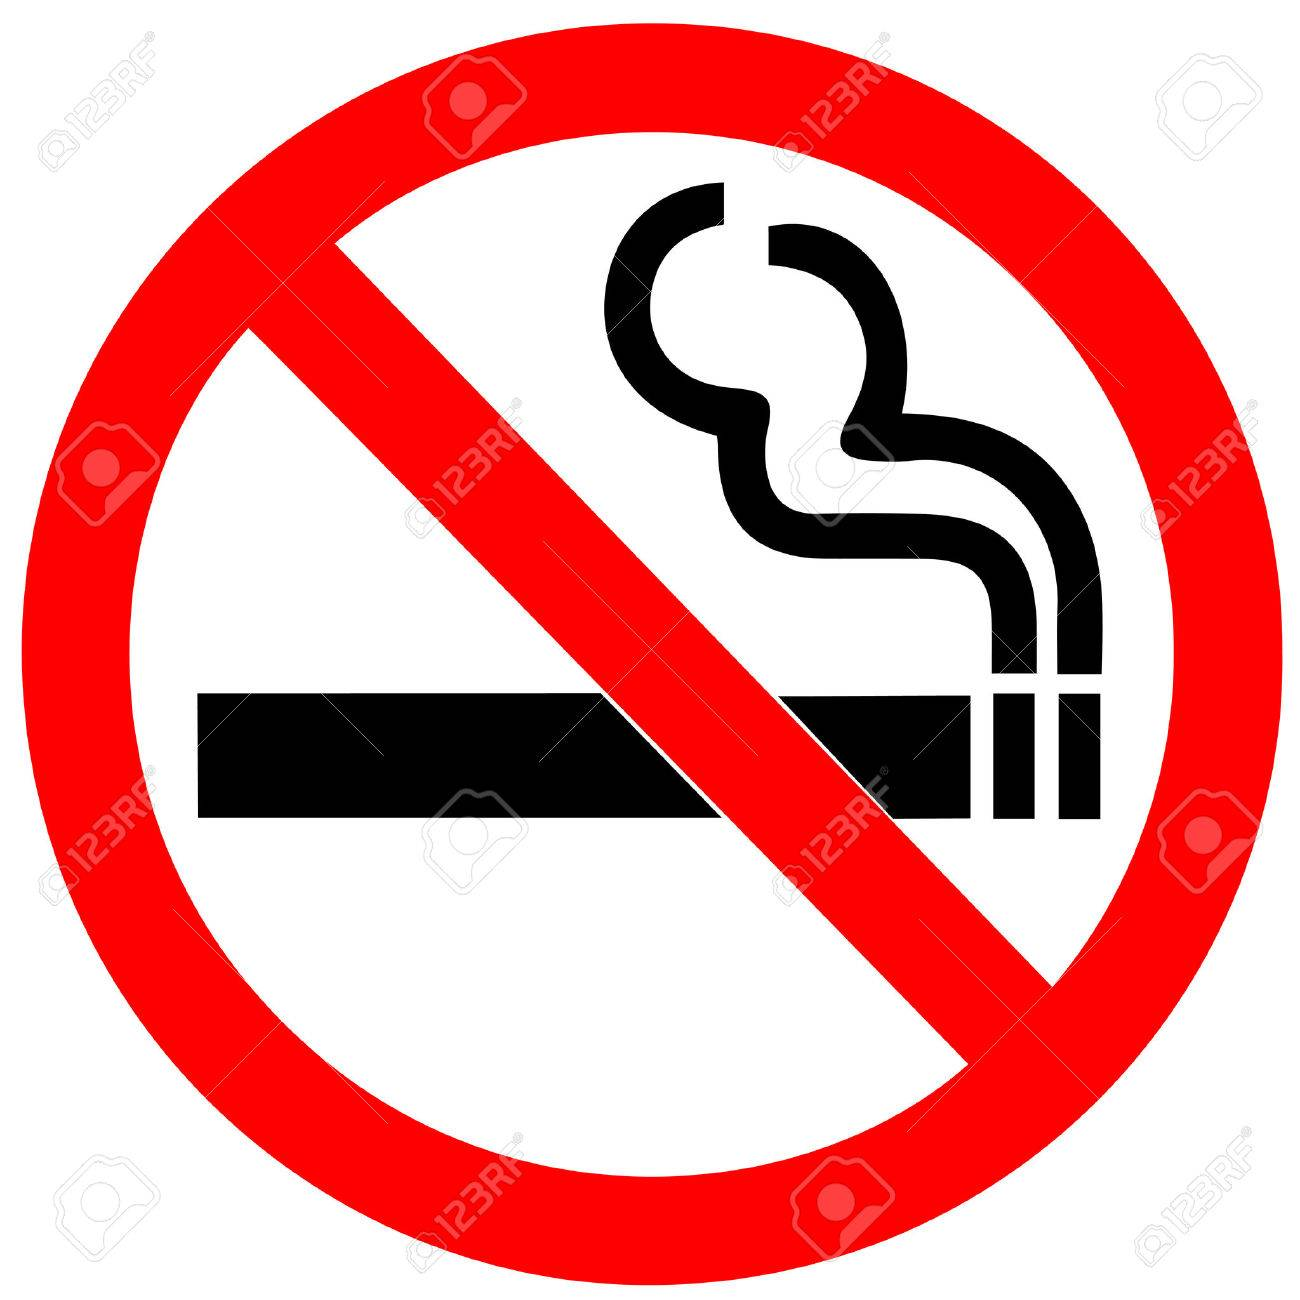 no smoking sign on white background royalty free cliparts vectors rh 123rf com no smoking vector sign no smoking vector image